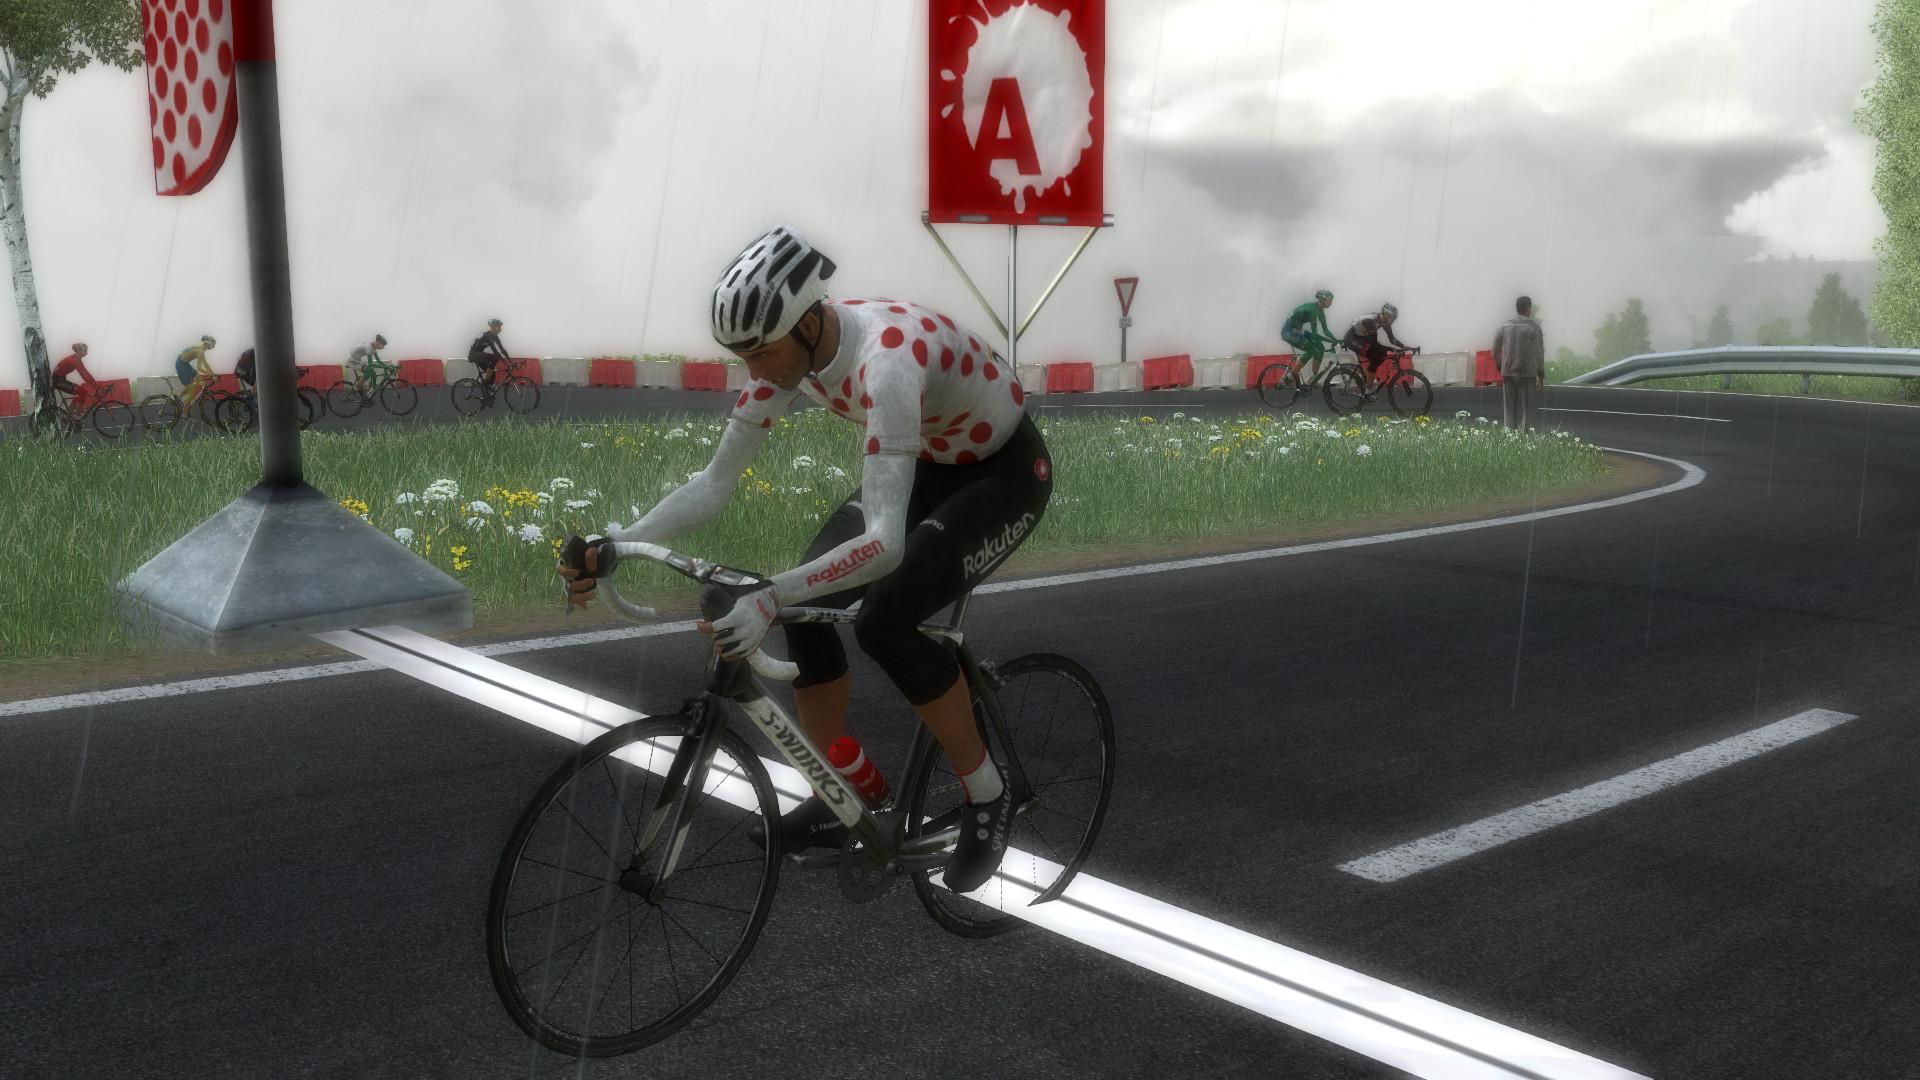 pcmdaily.com/images/mg/2019/Races/PTHC/Pologne/E5/12.jpg